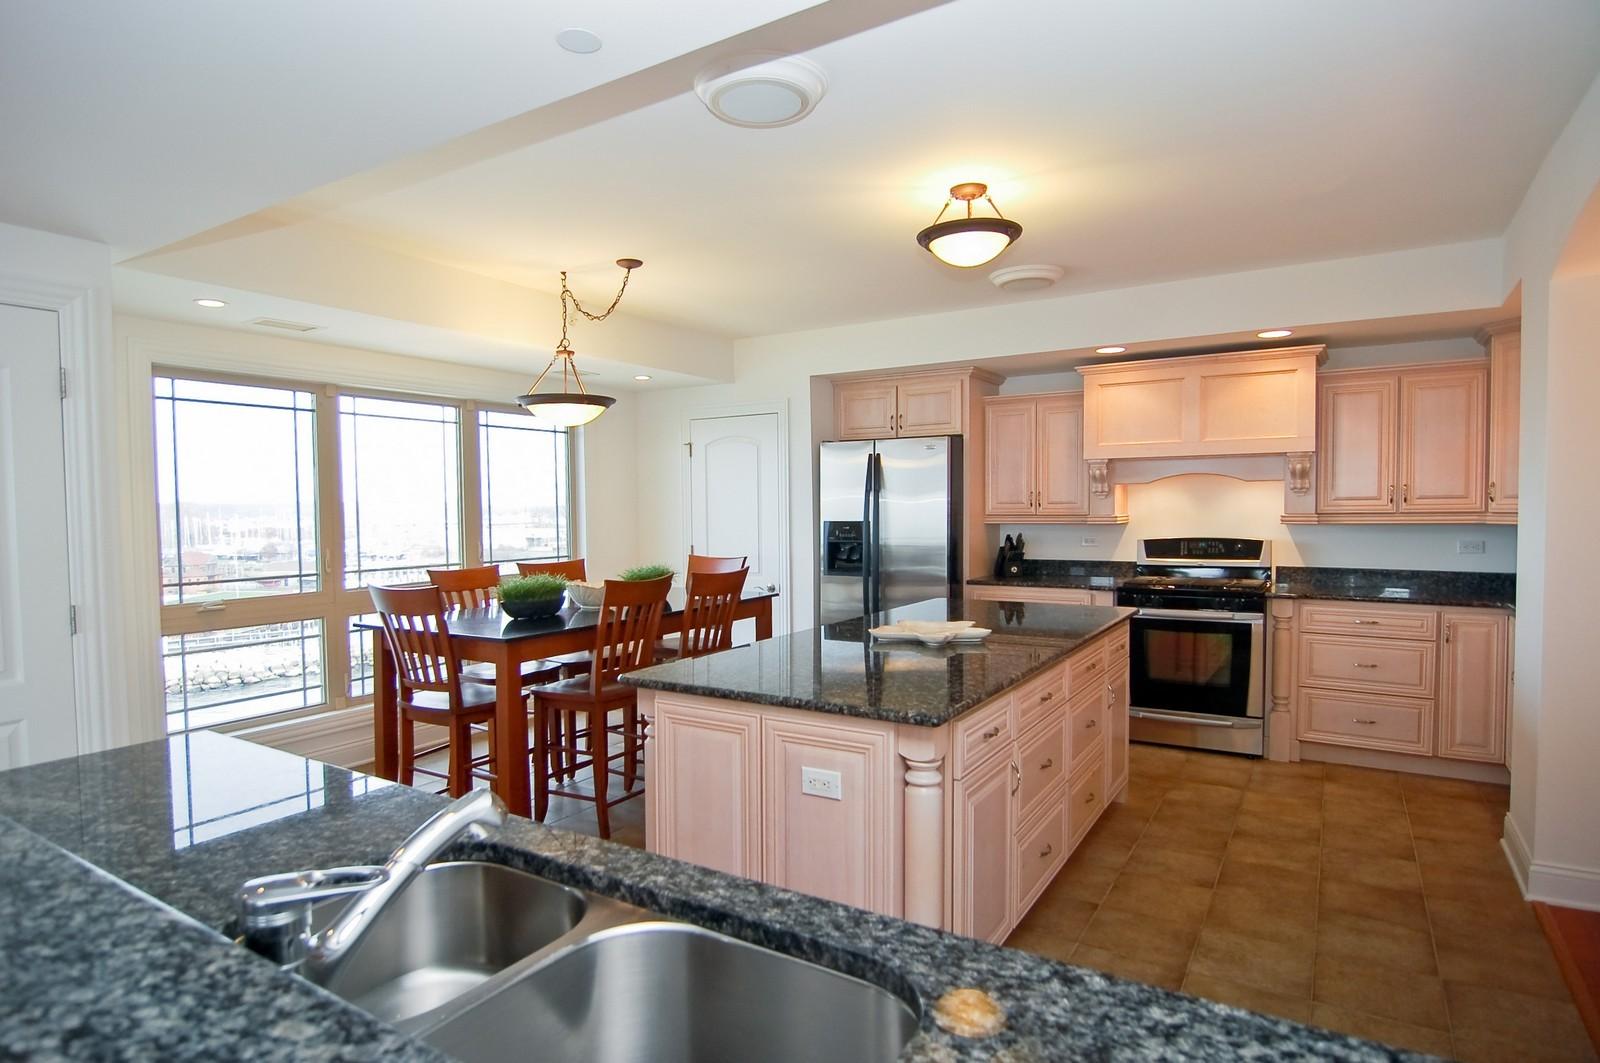 Real Estate Photography - 200- 7B Lake Street, St Joseph, MI, 49085 - Kitchen